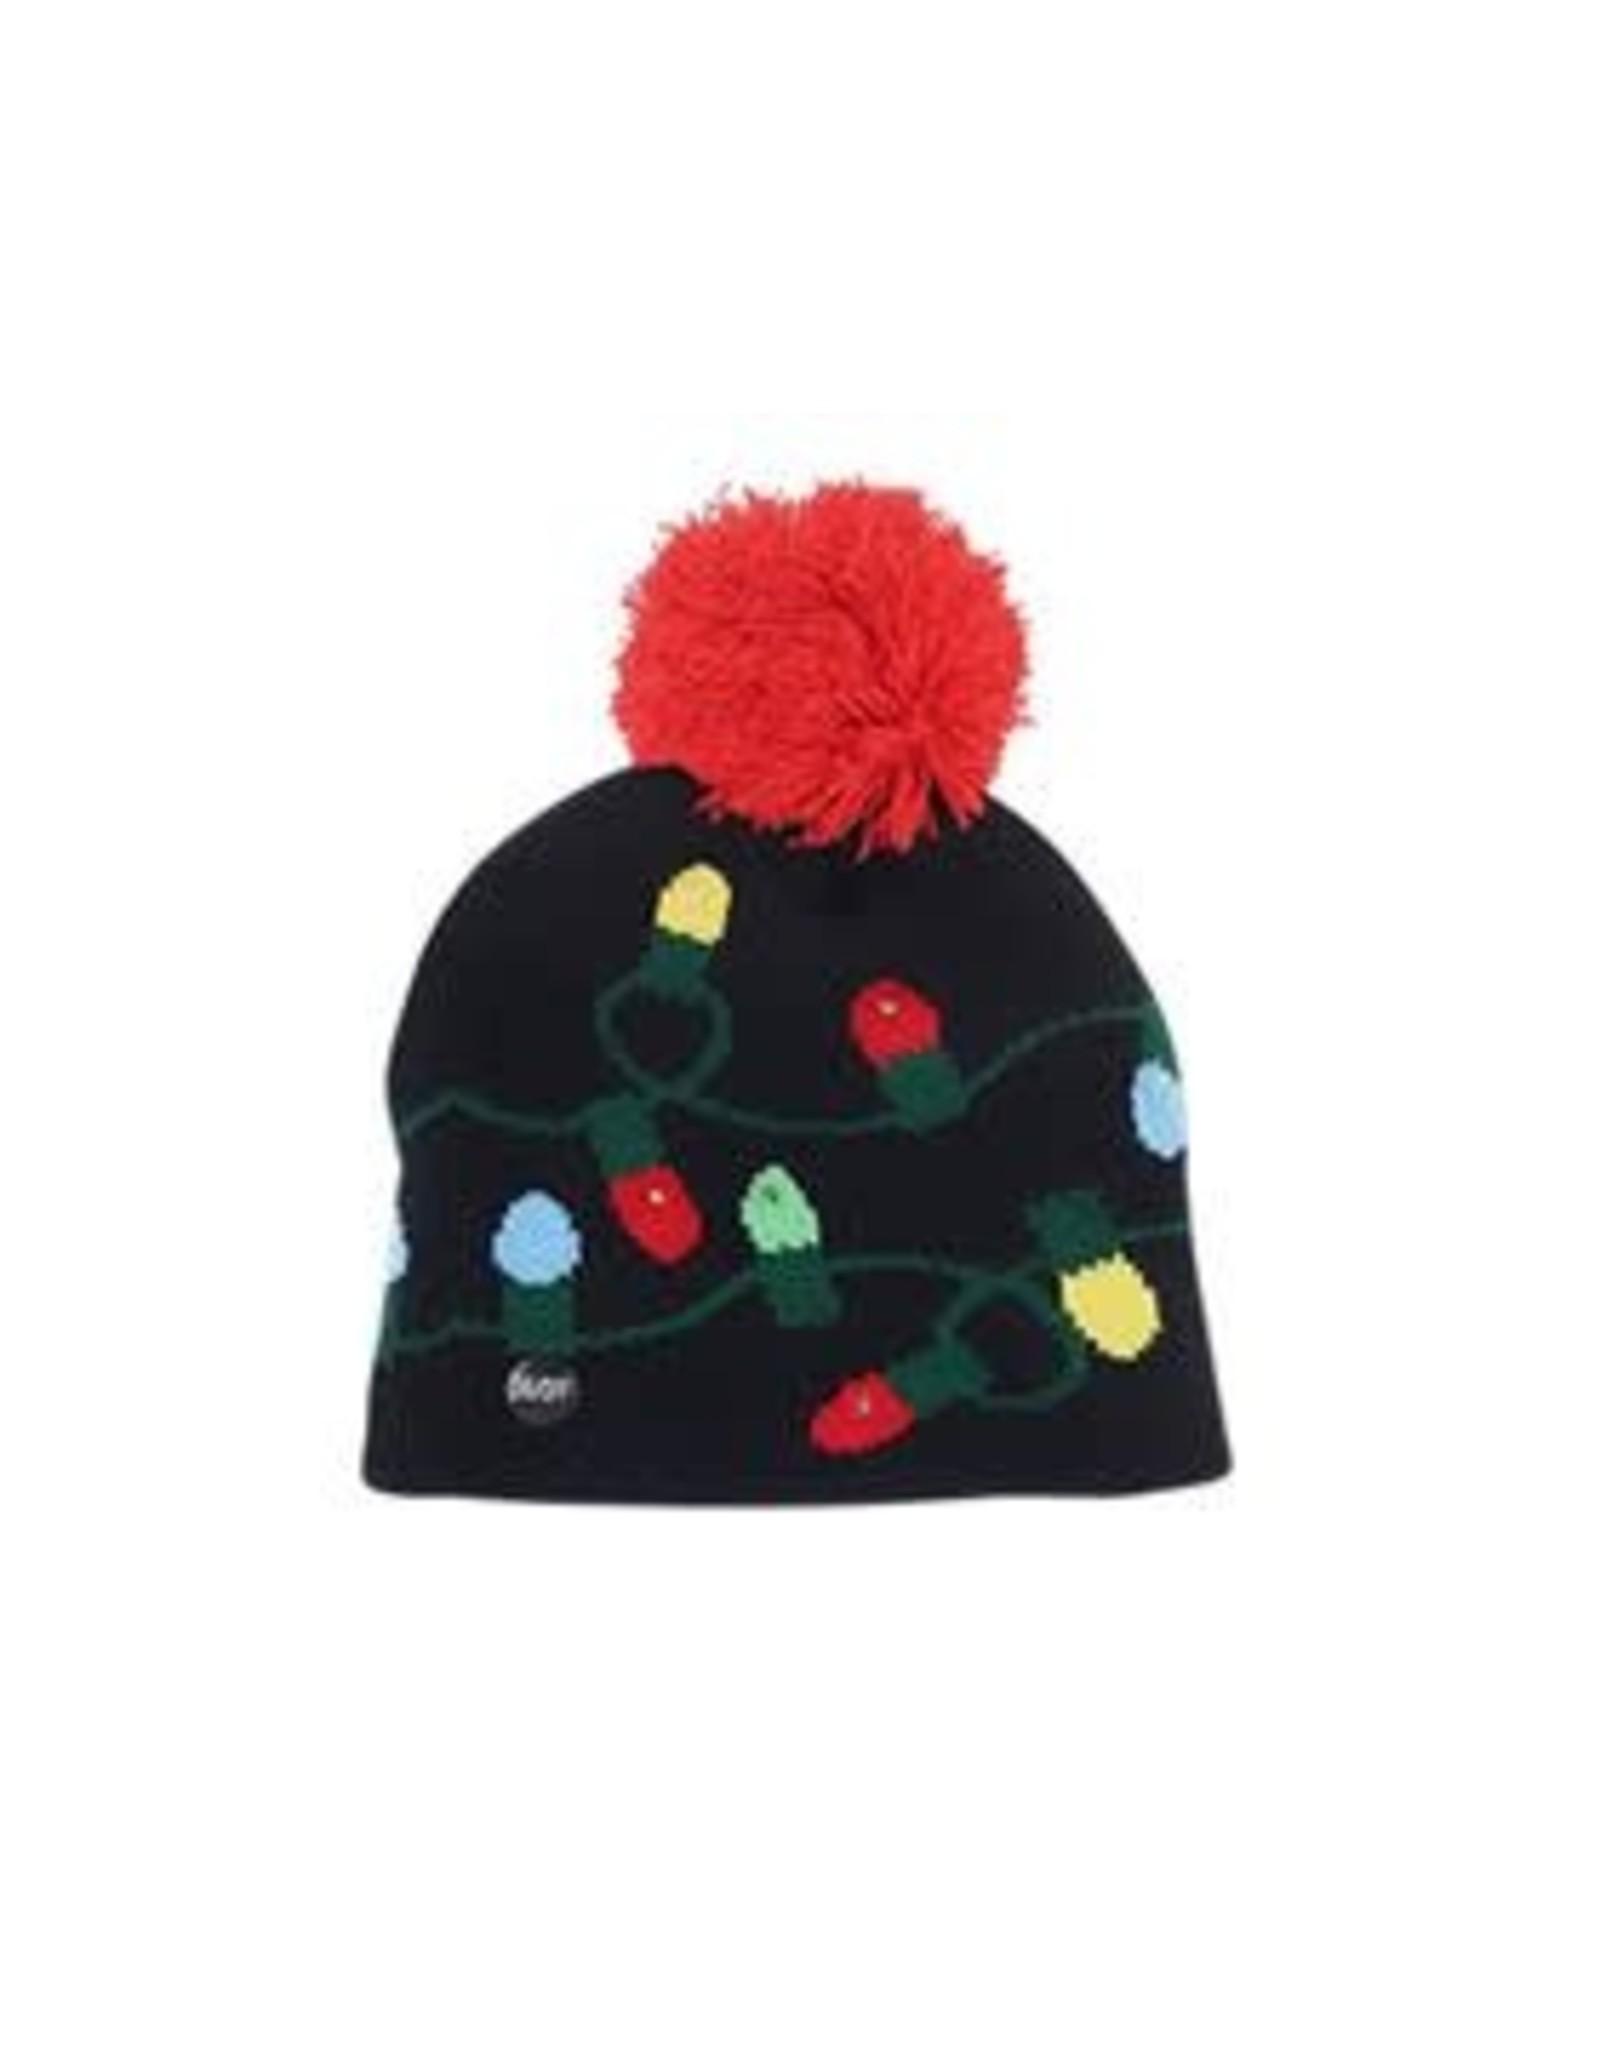 Kids Winter Light Up Hat - Bulb